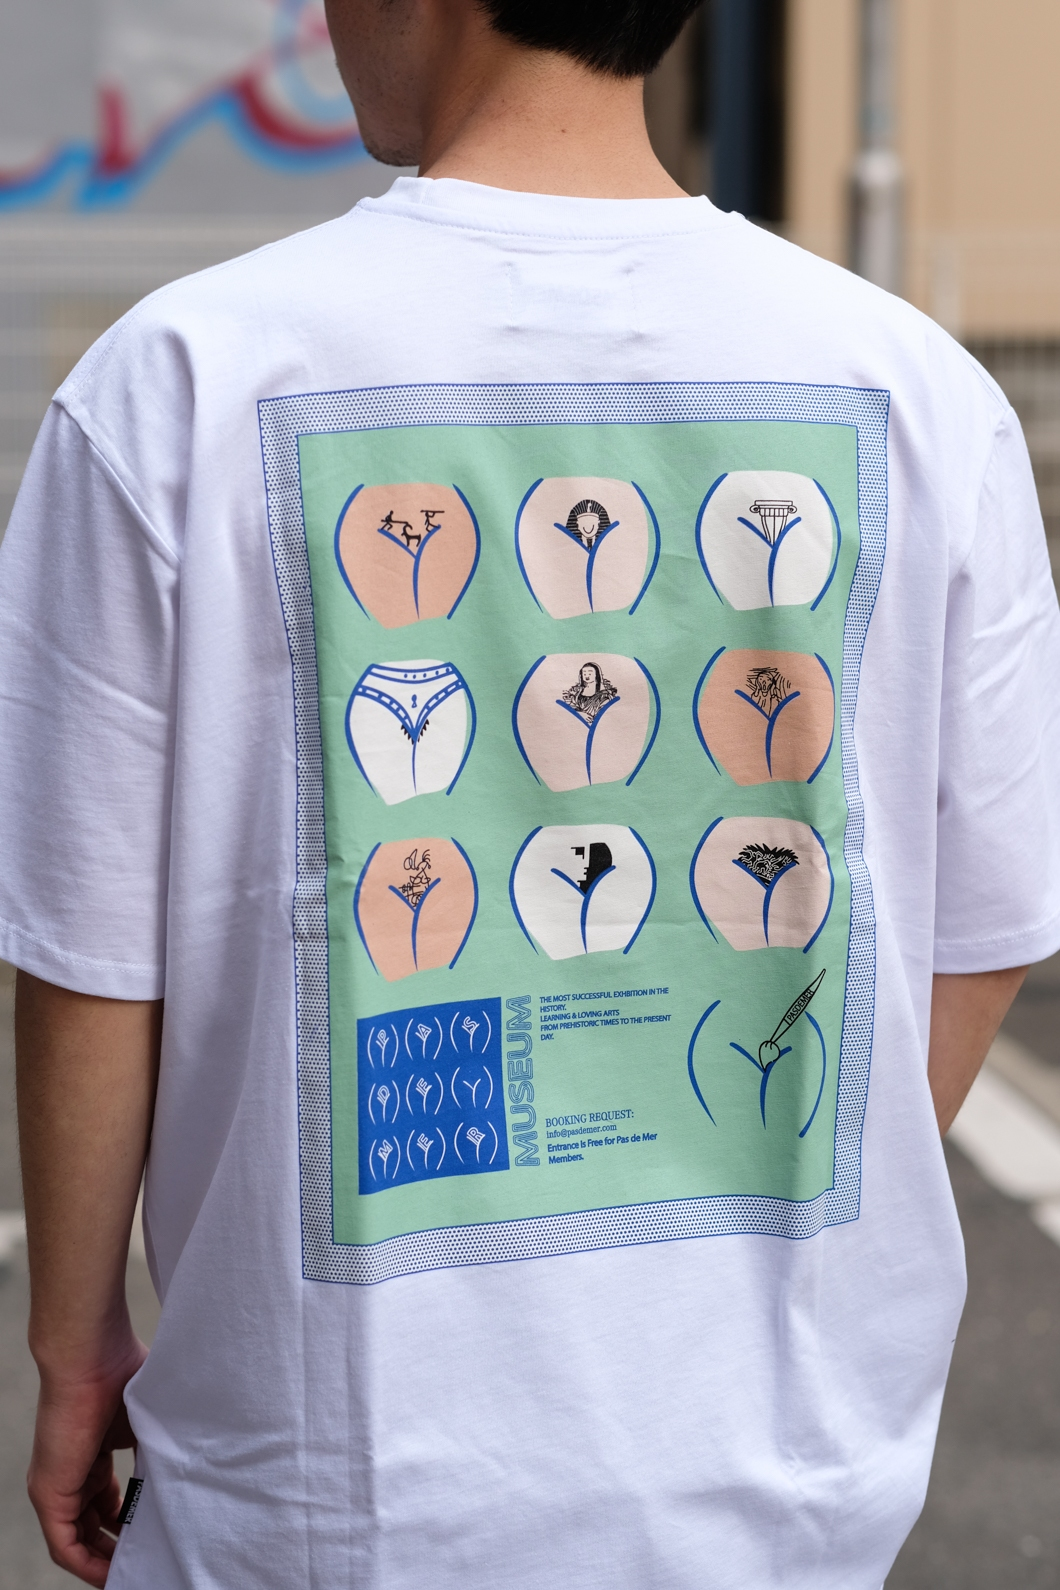 【PAS DE MER/パドゥメ】MUSEUM T-SHIRT Tシャツ / WHITE